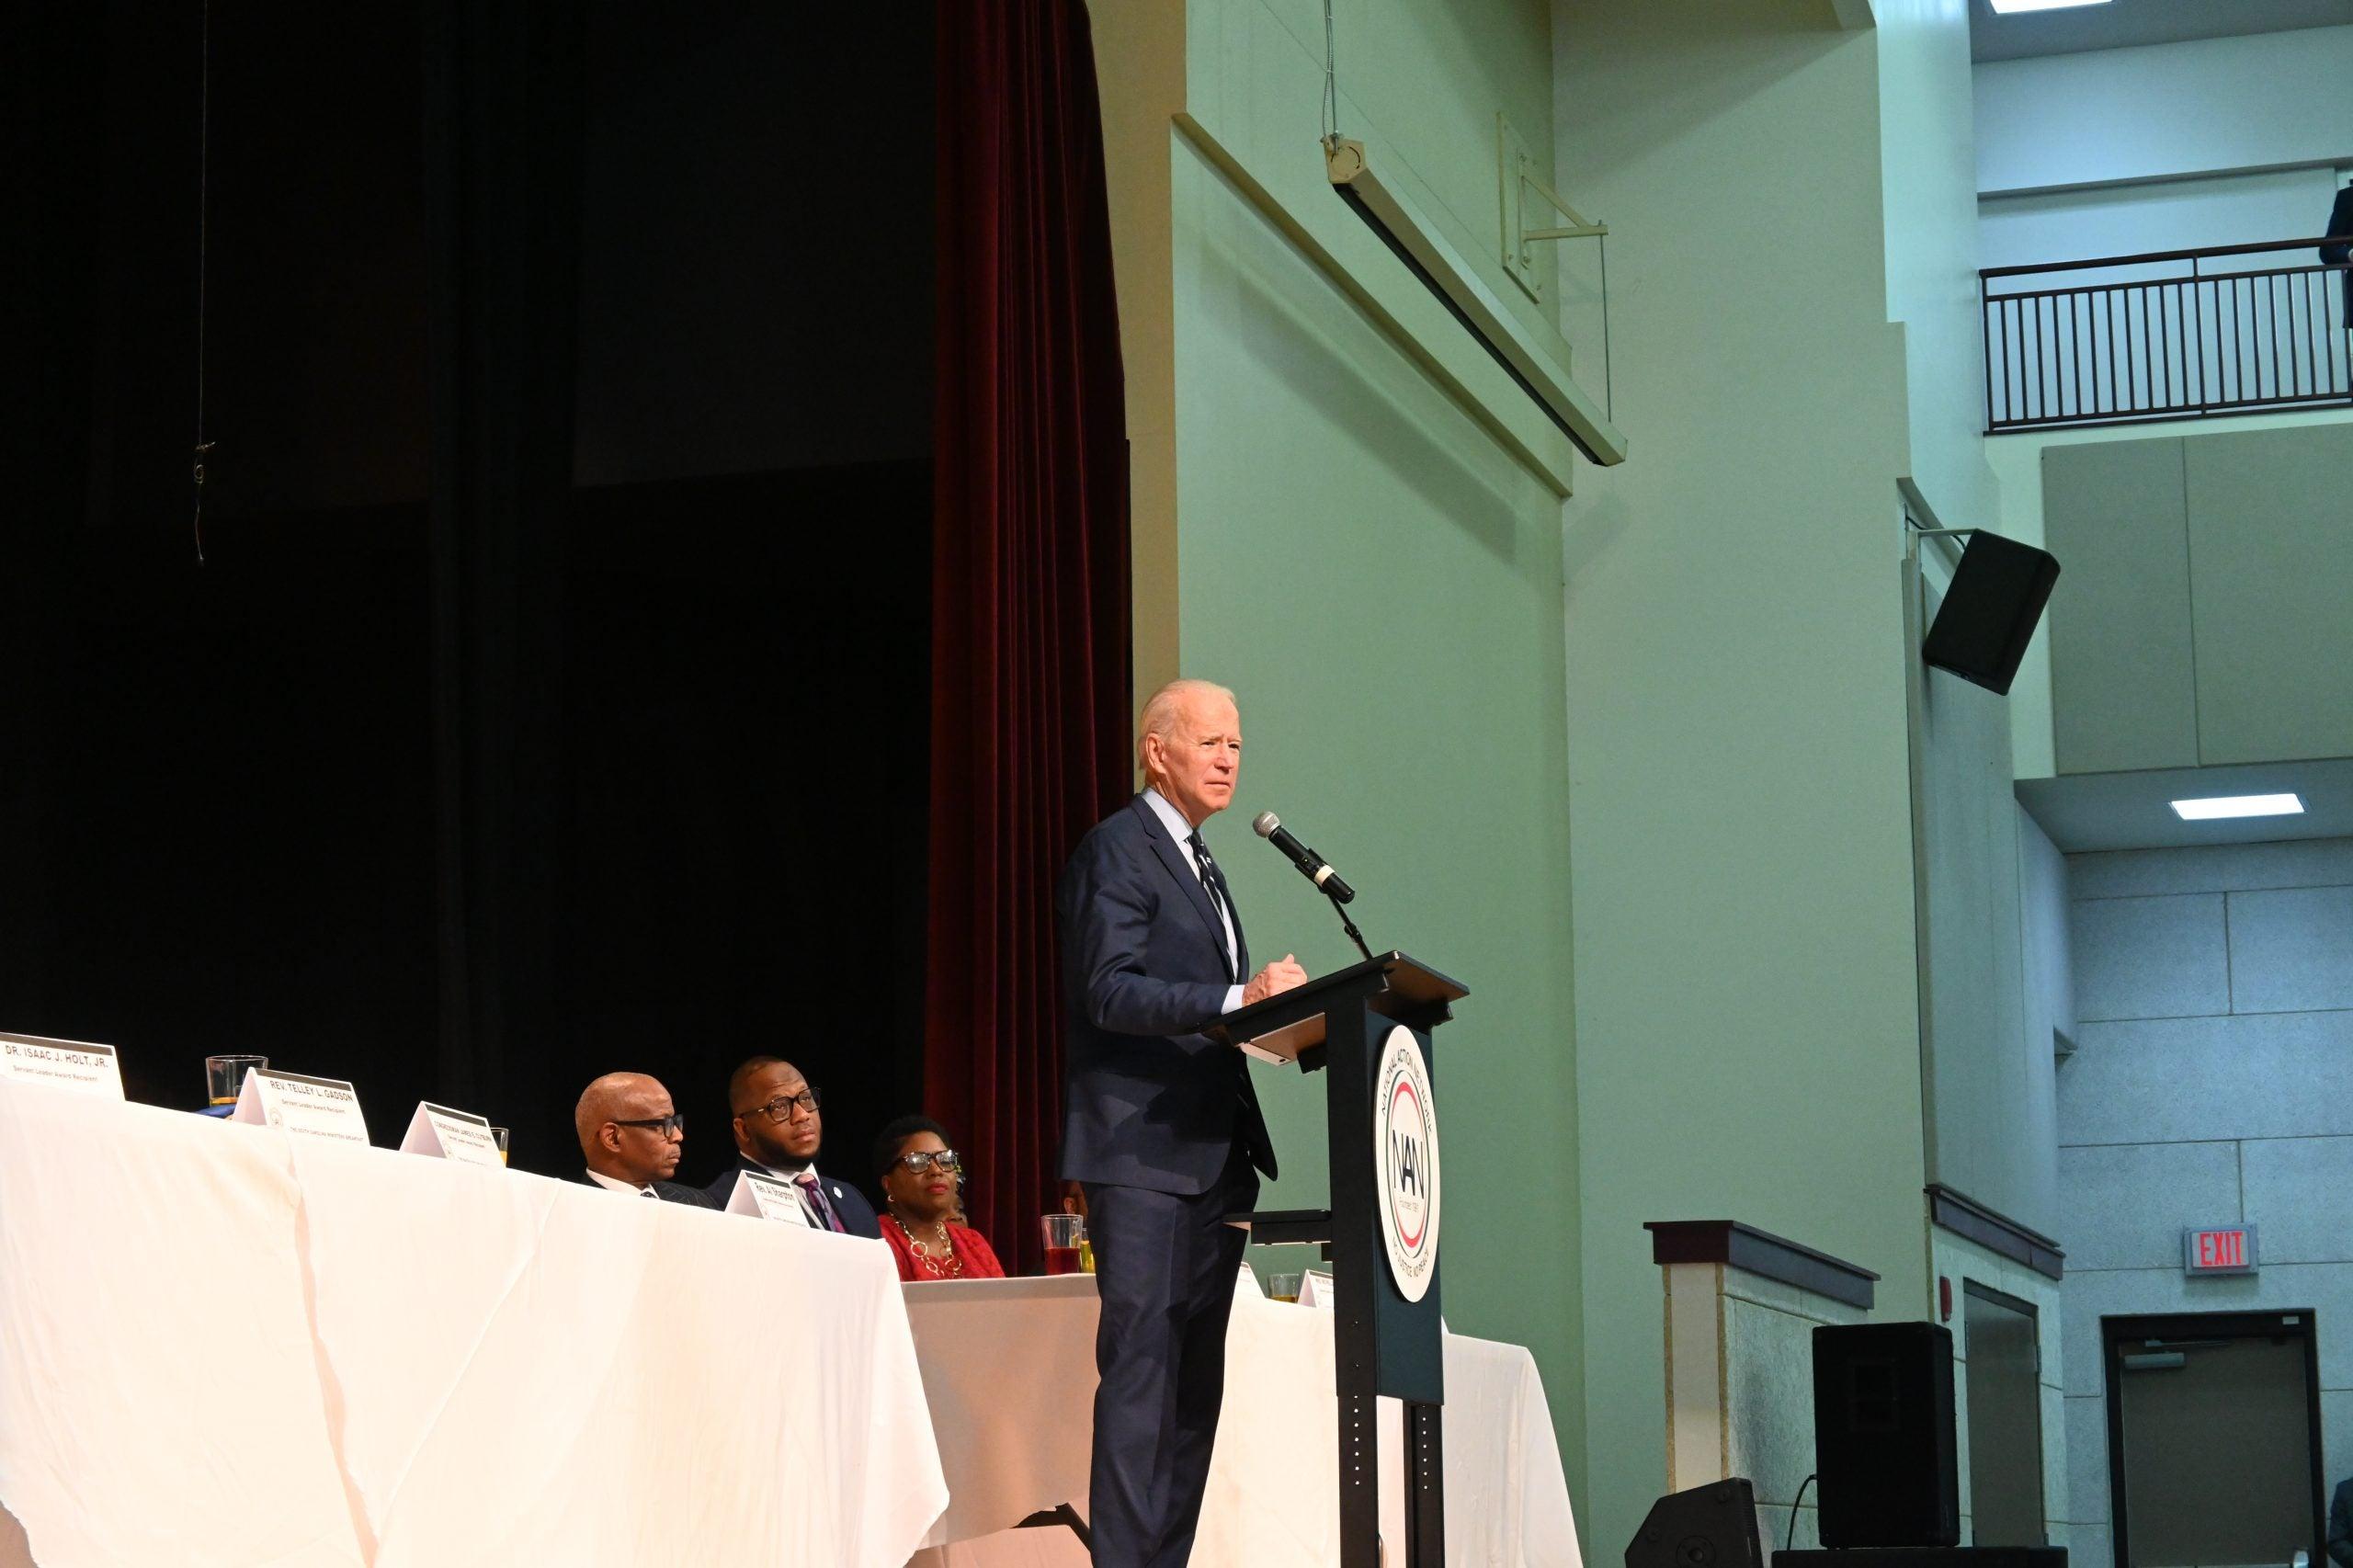 candidate Joe Biden